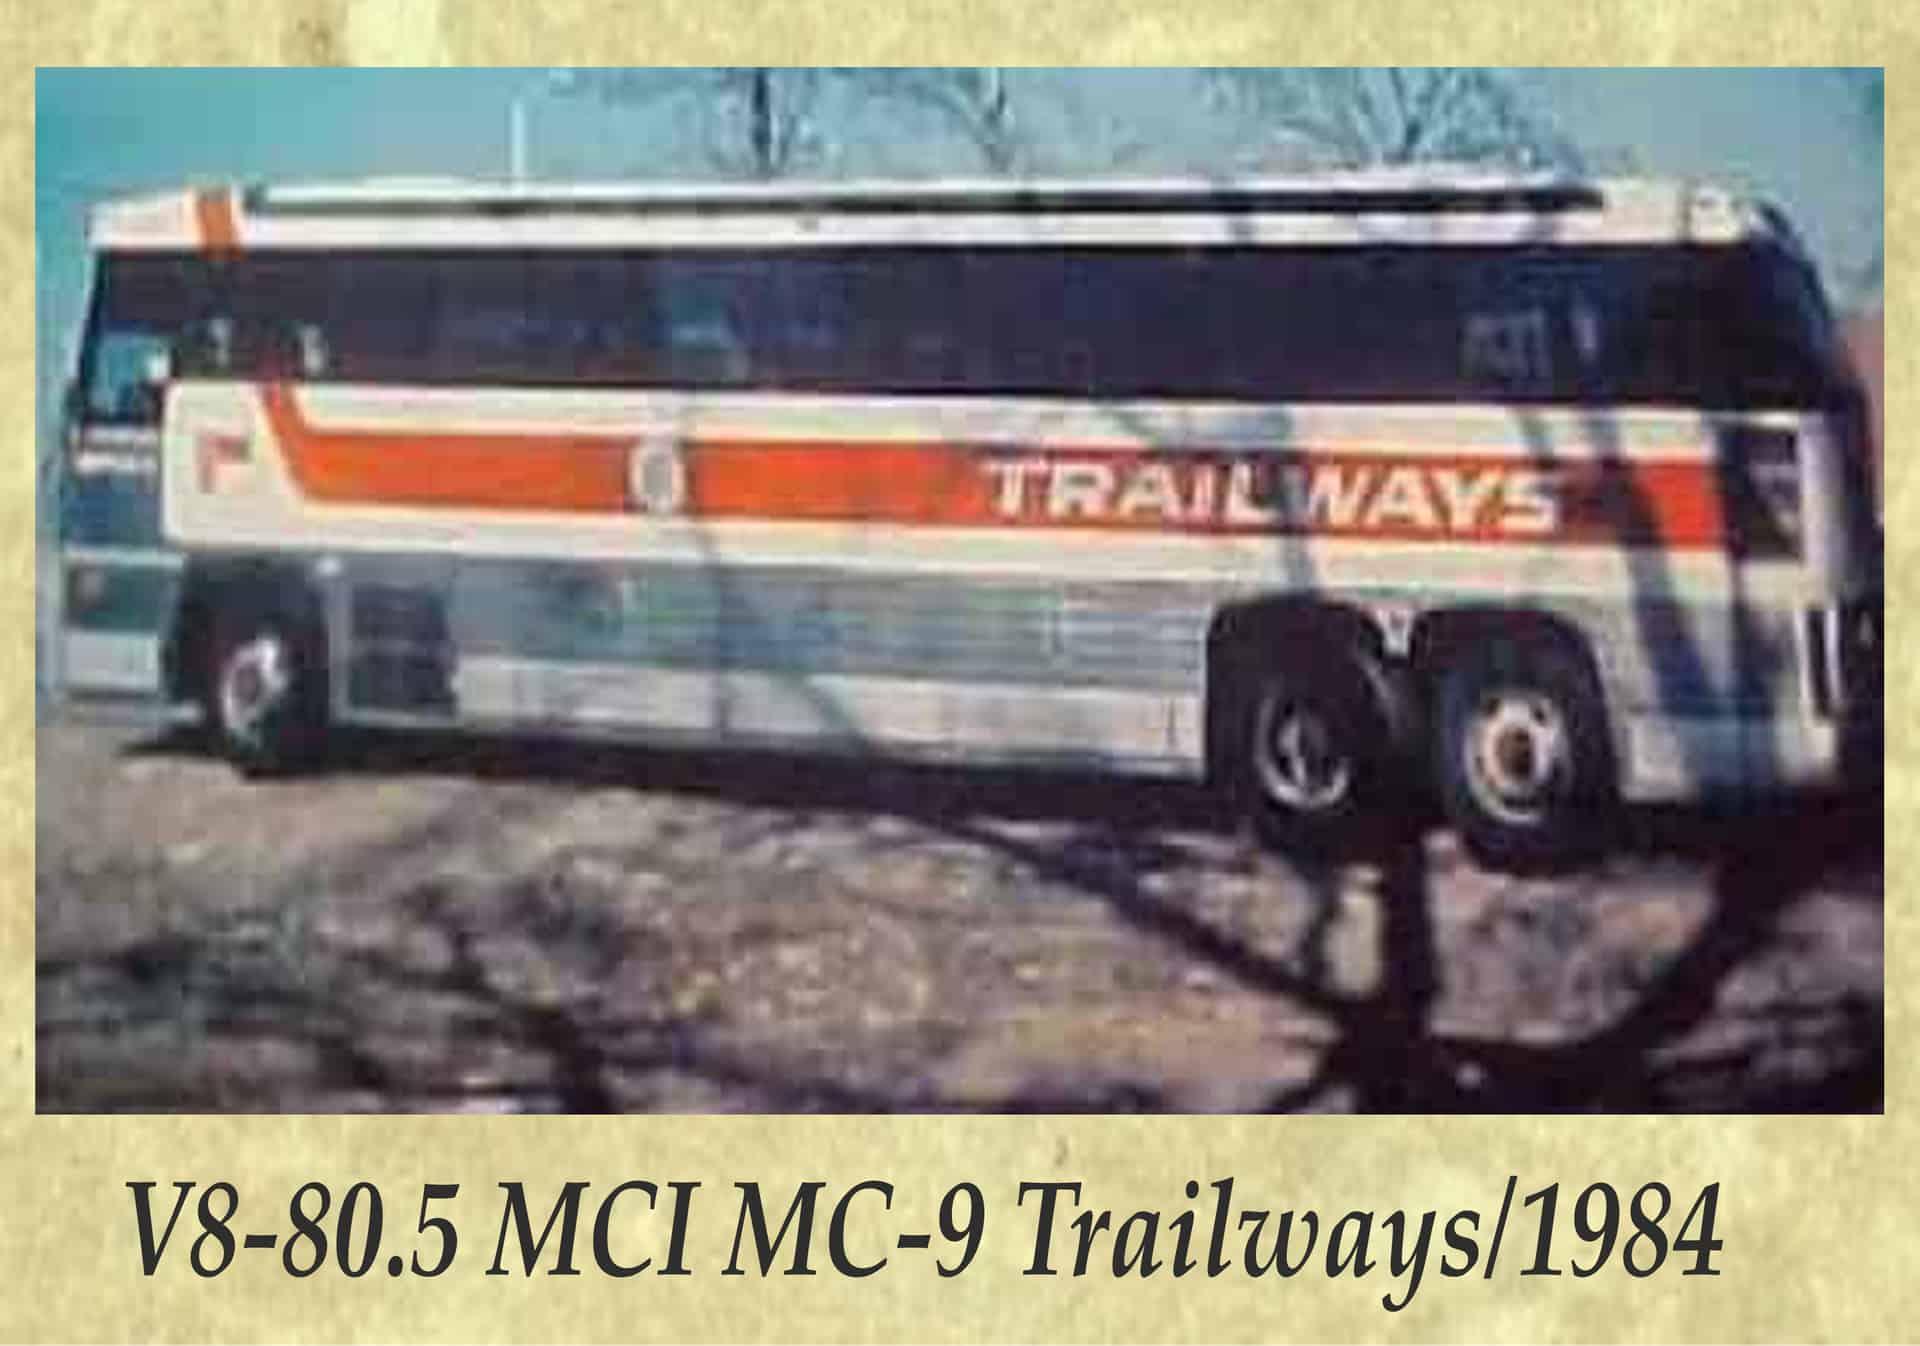 V8-80.5 MCI MC-9 Trailways 1984